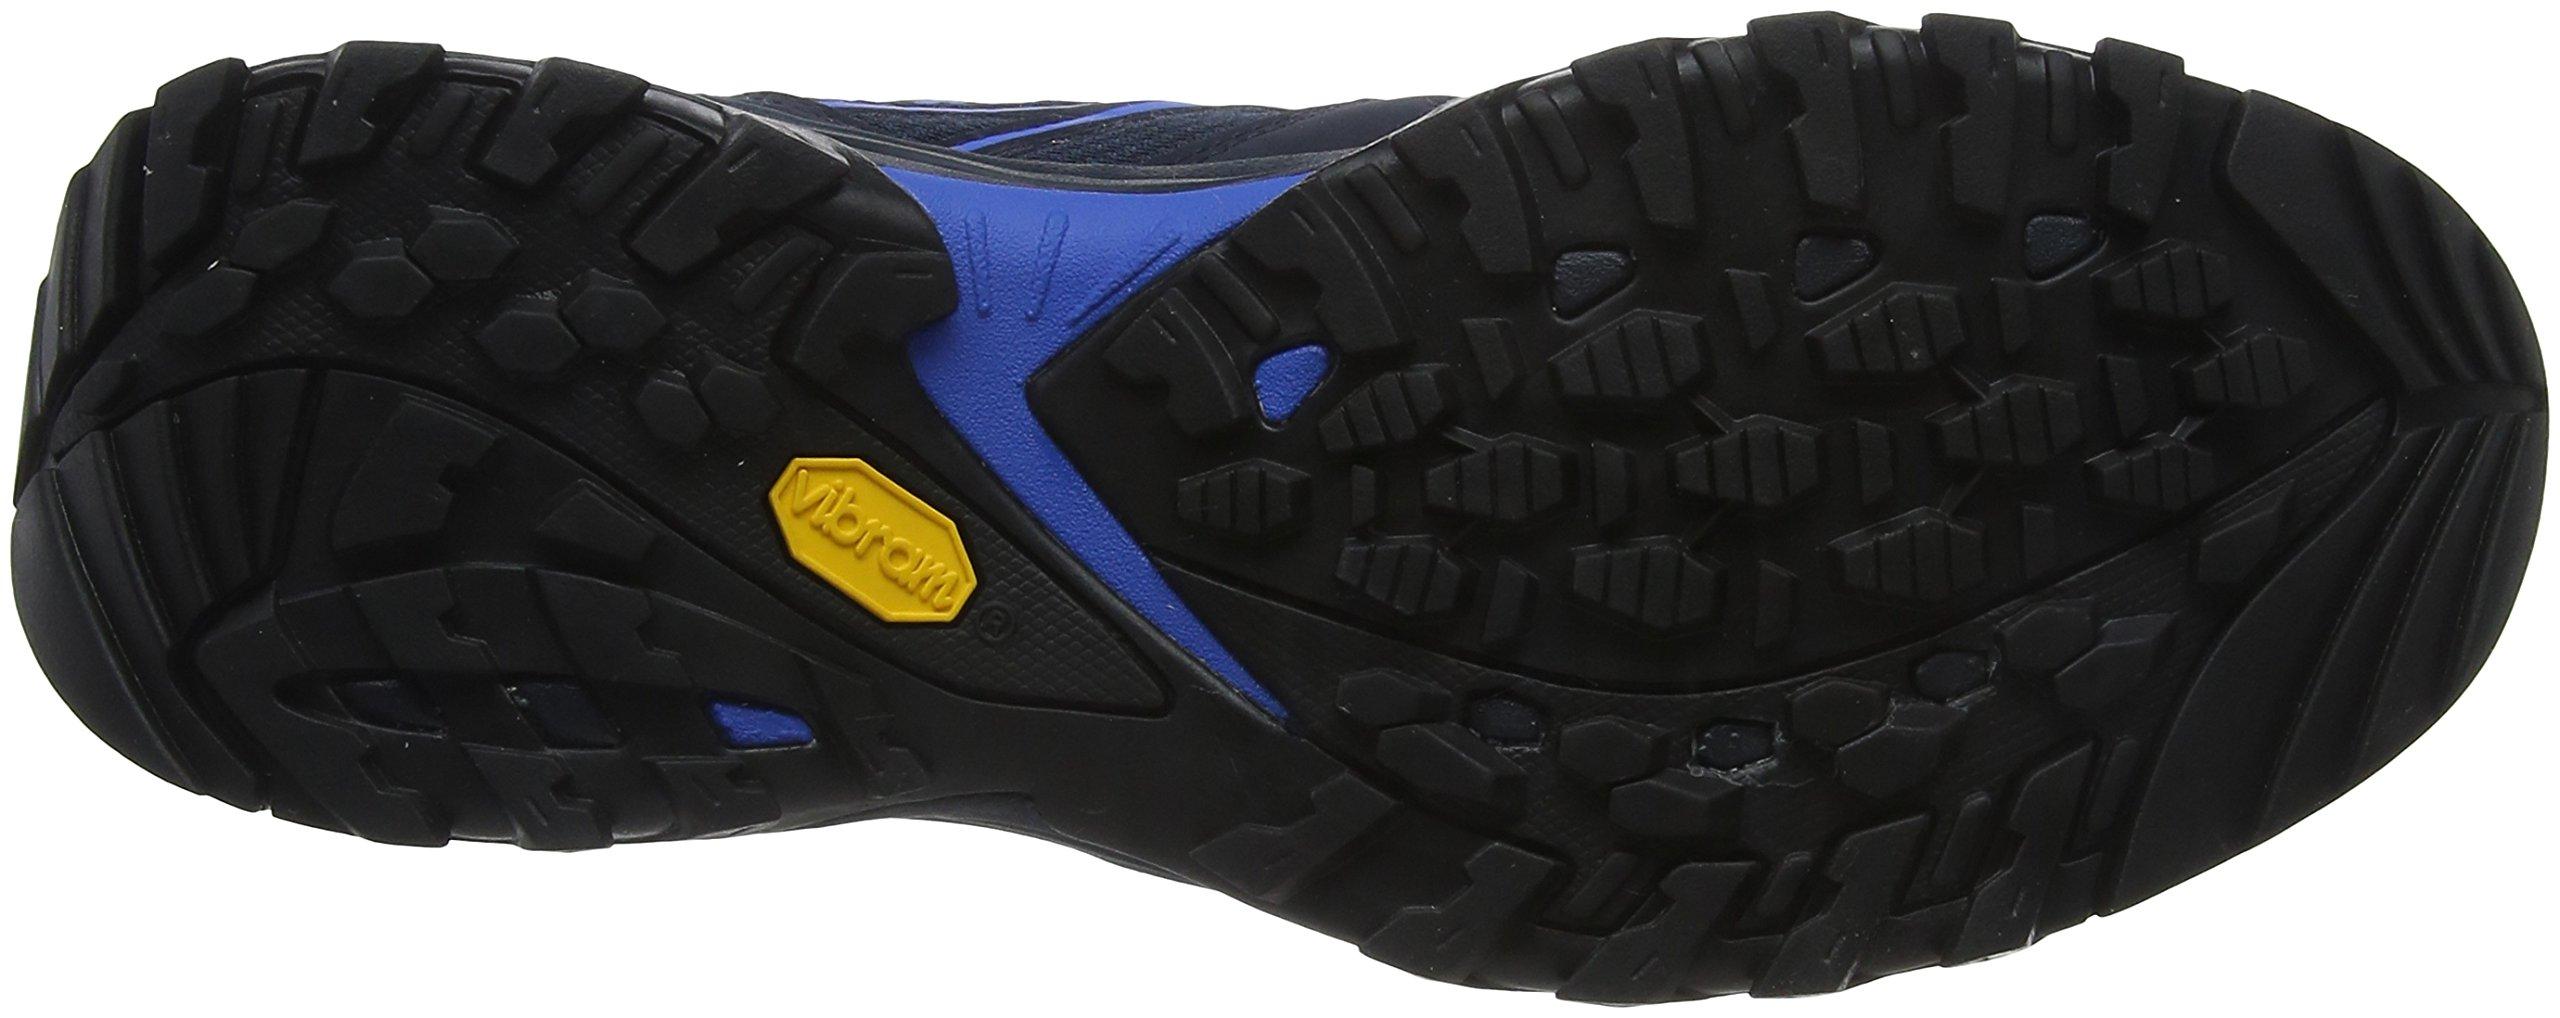 71NK6XbfvbL - THE NORTH FACE Men's Hedgehog Fastpack Mid Gtx High Rise Hiking Boots